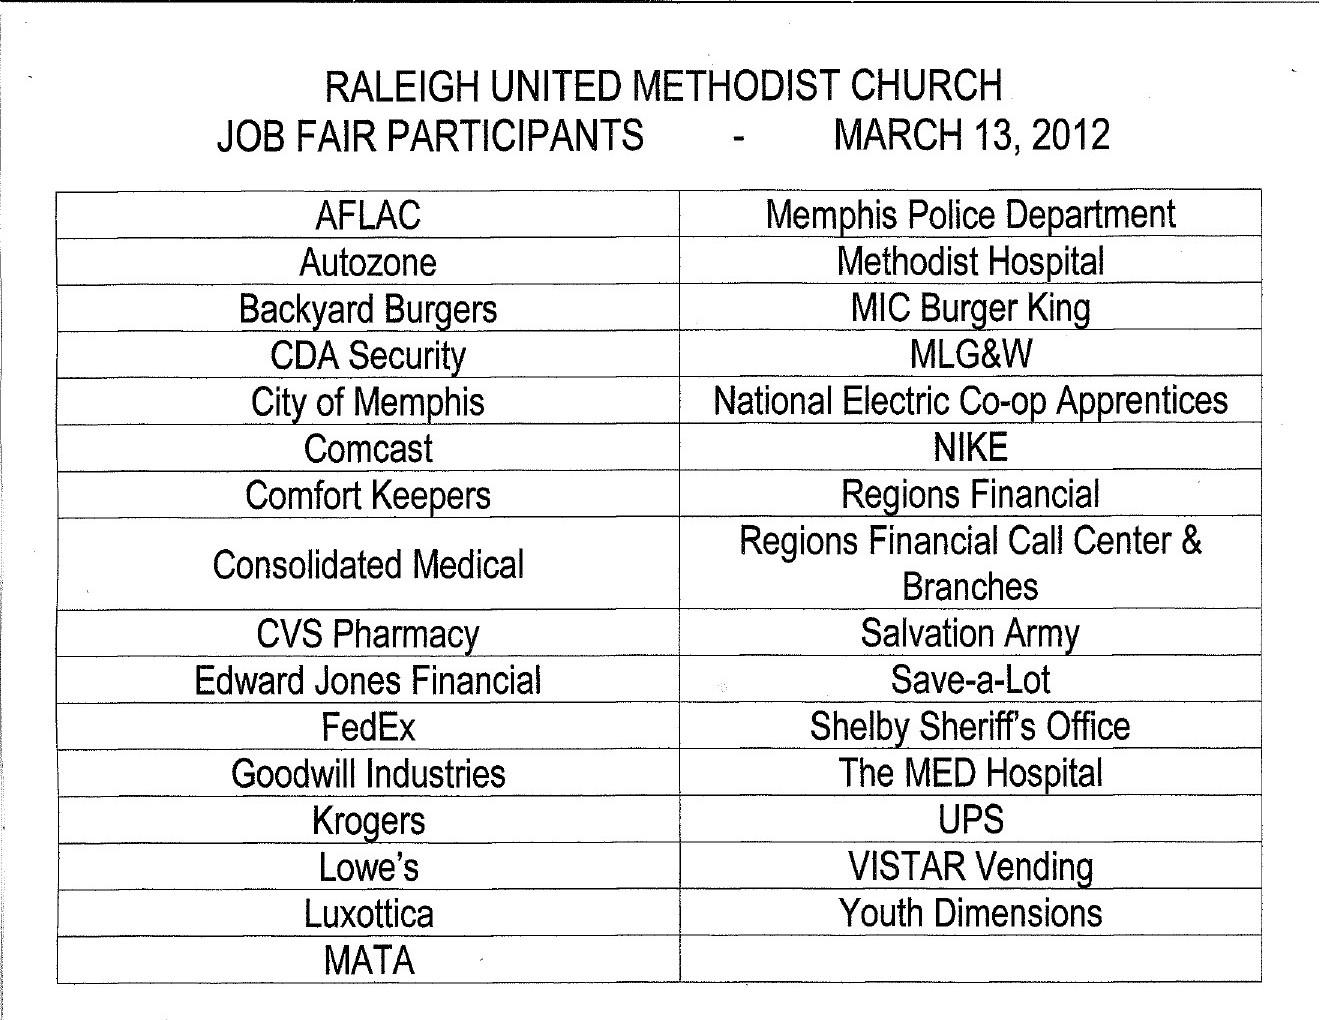 Raleigh United Methodist Church | Job & Career News from the